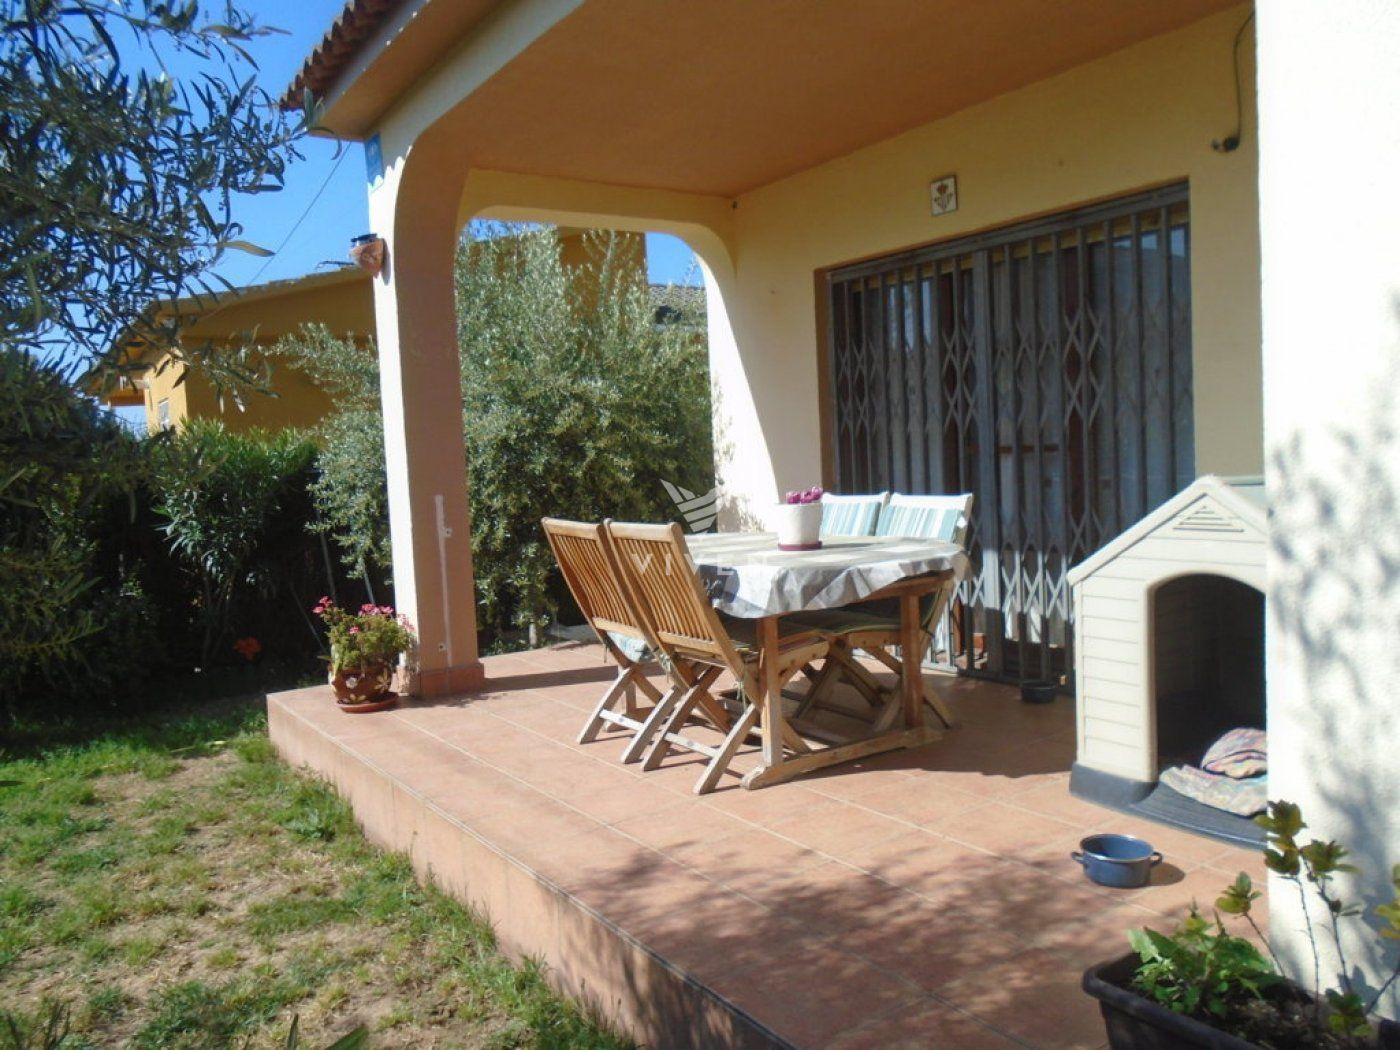 House for sale in LA GAVIOTA, Cubelles